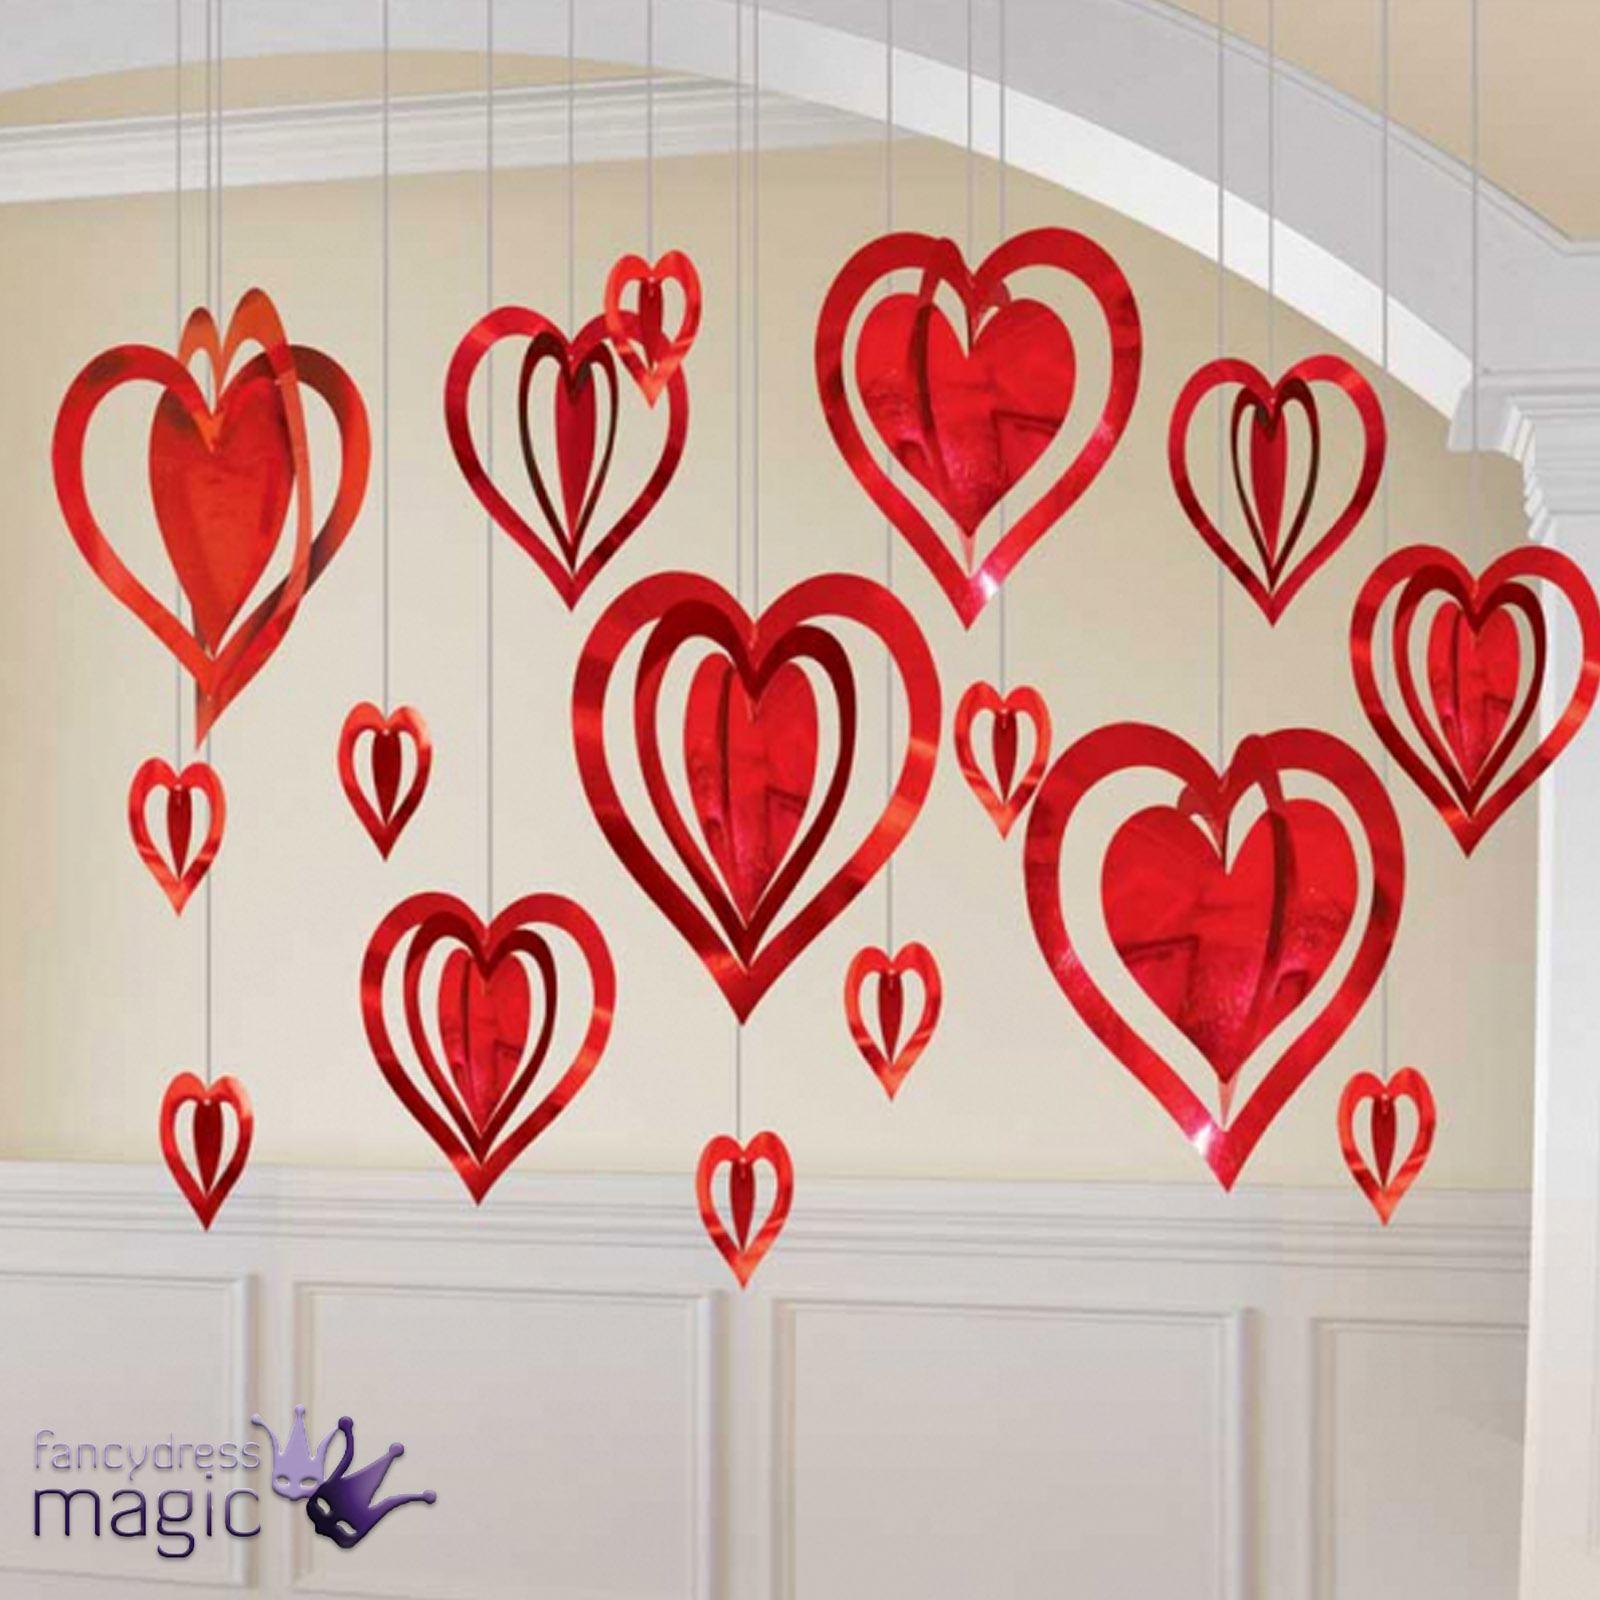 3d San Valentin Boda Compromiso Corazon Fiesta Decoracion Colgante - Decoracion-san-valentin